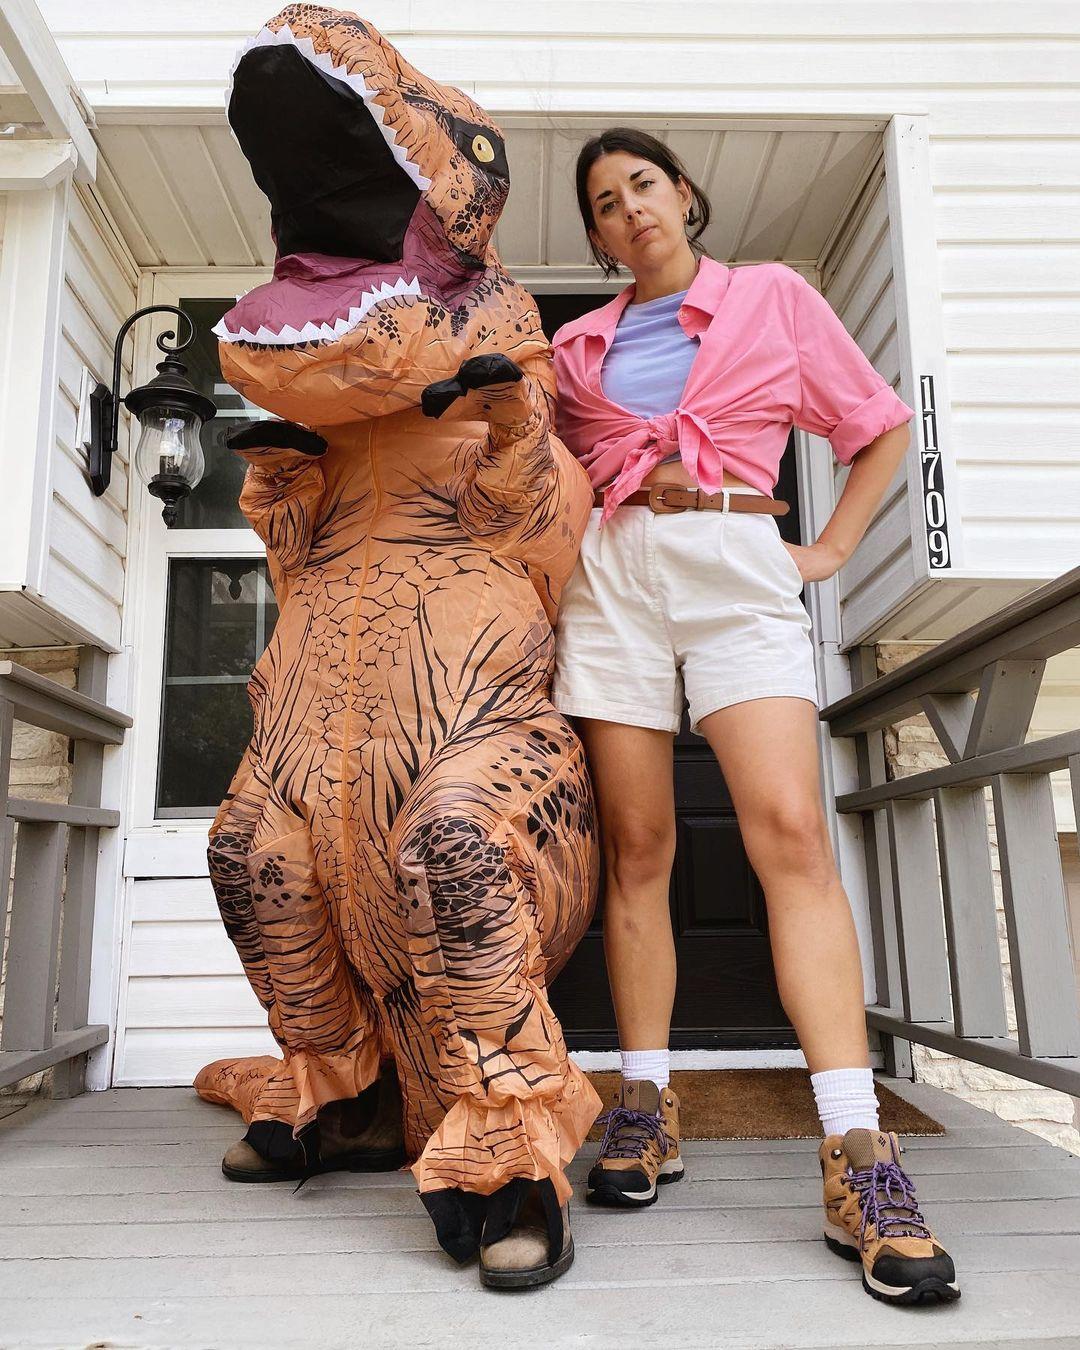 jurassic park funny couple costume